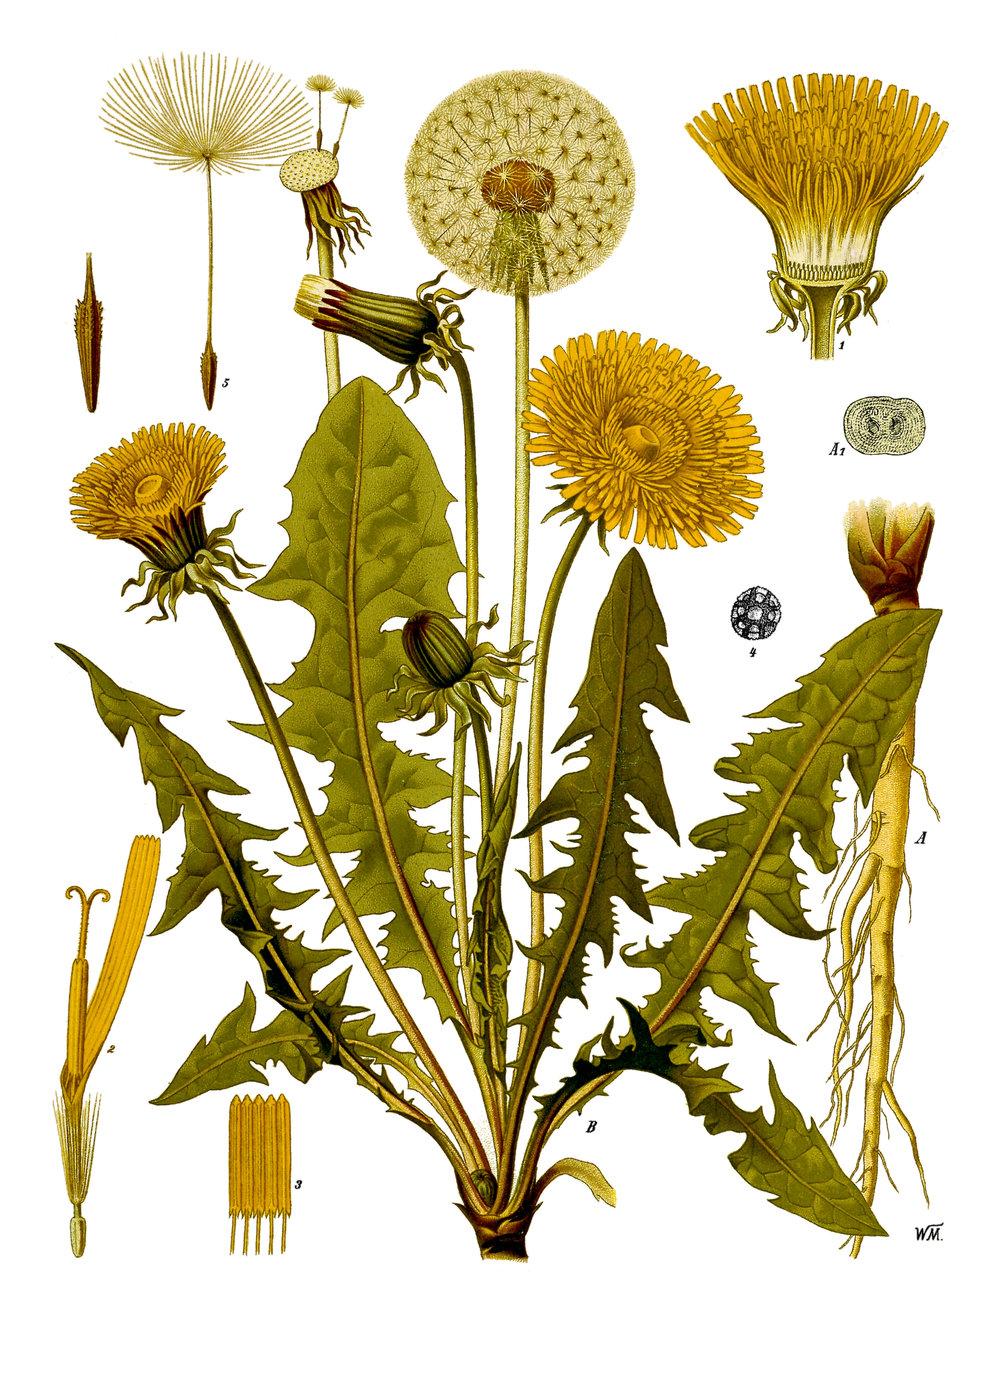 Taraxacum officinale . From Köhler's  Medizinal-Pflanzen,  1883